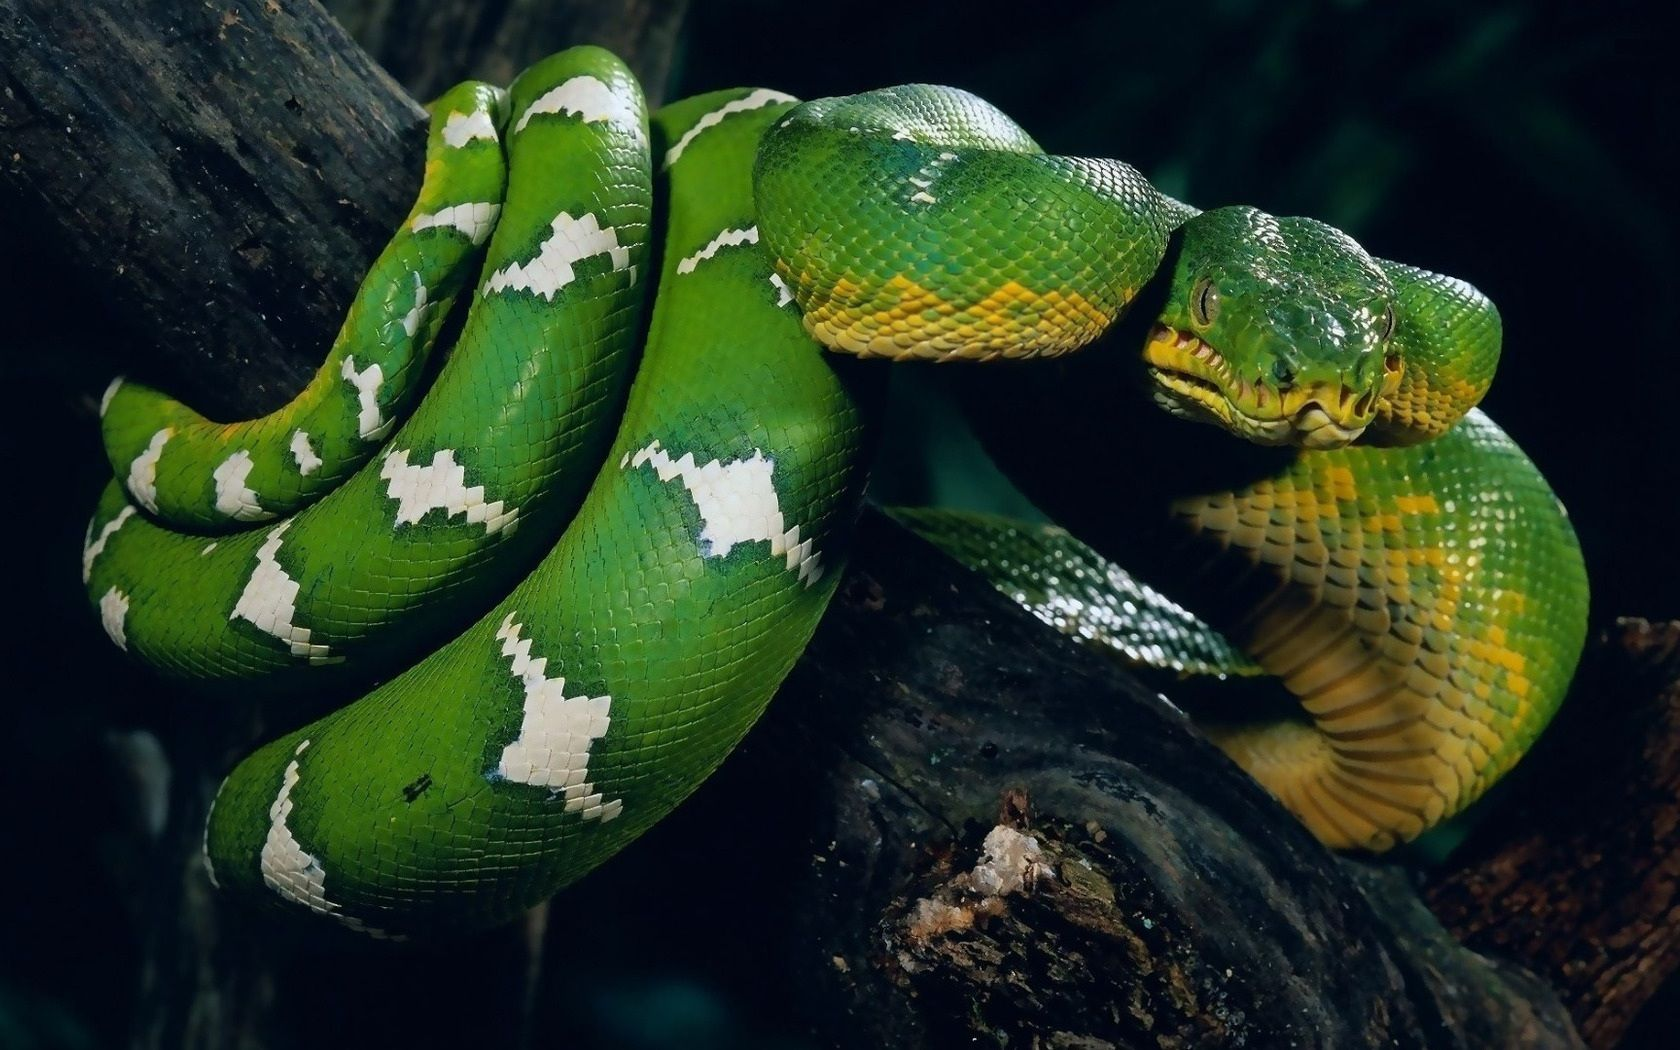 Dangerous Snake 1080p HD